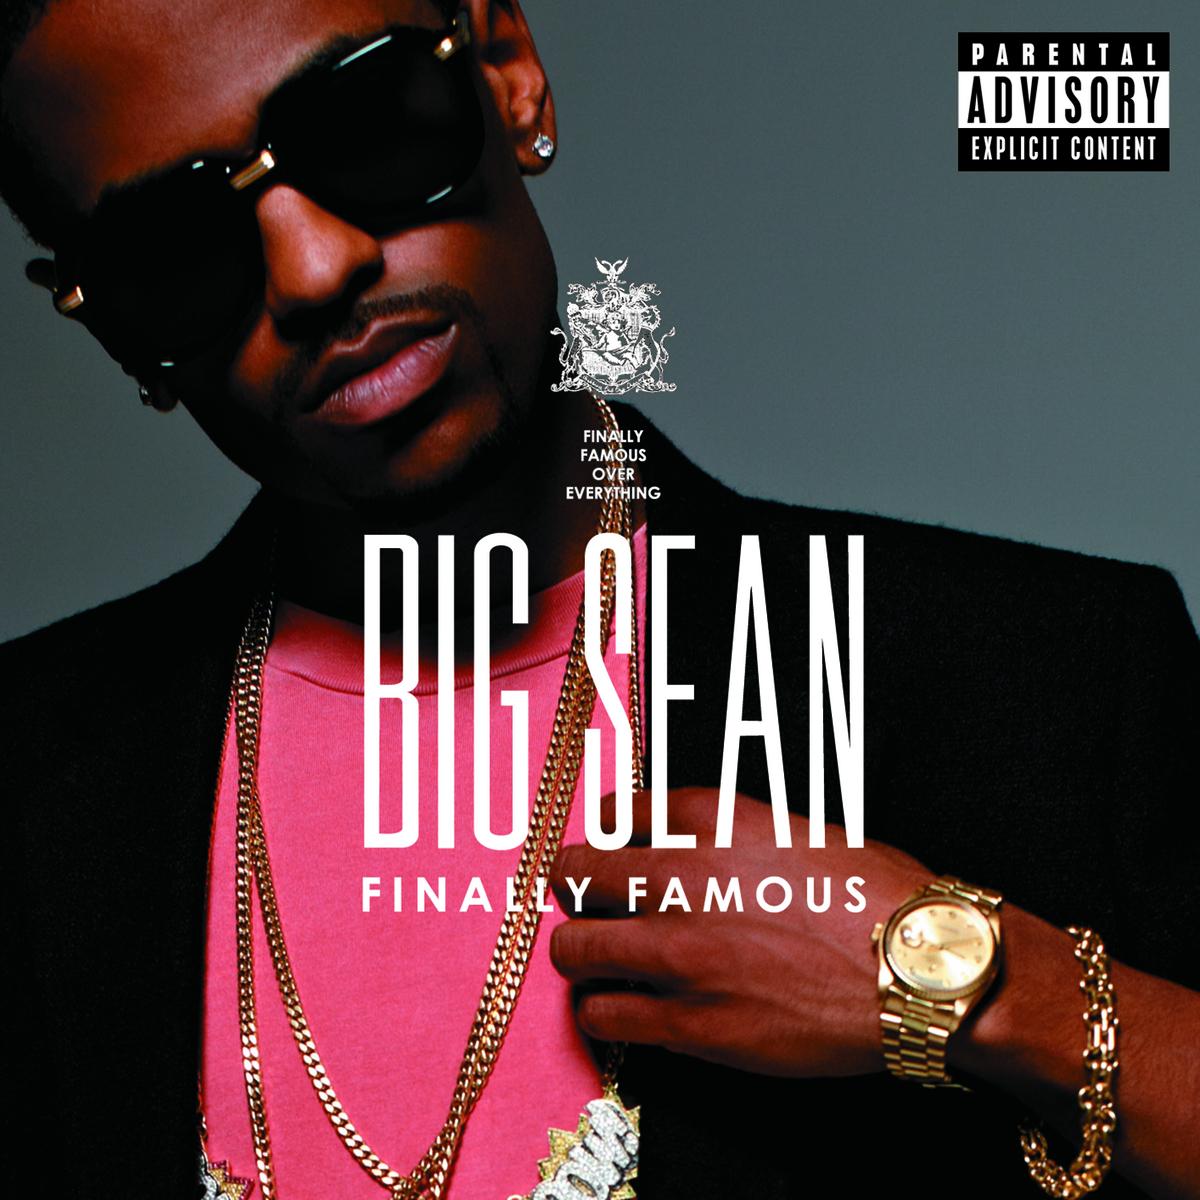 Big sean ass download